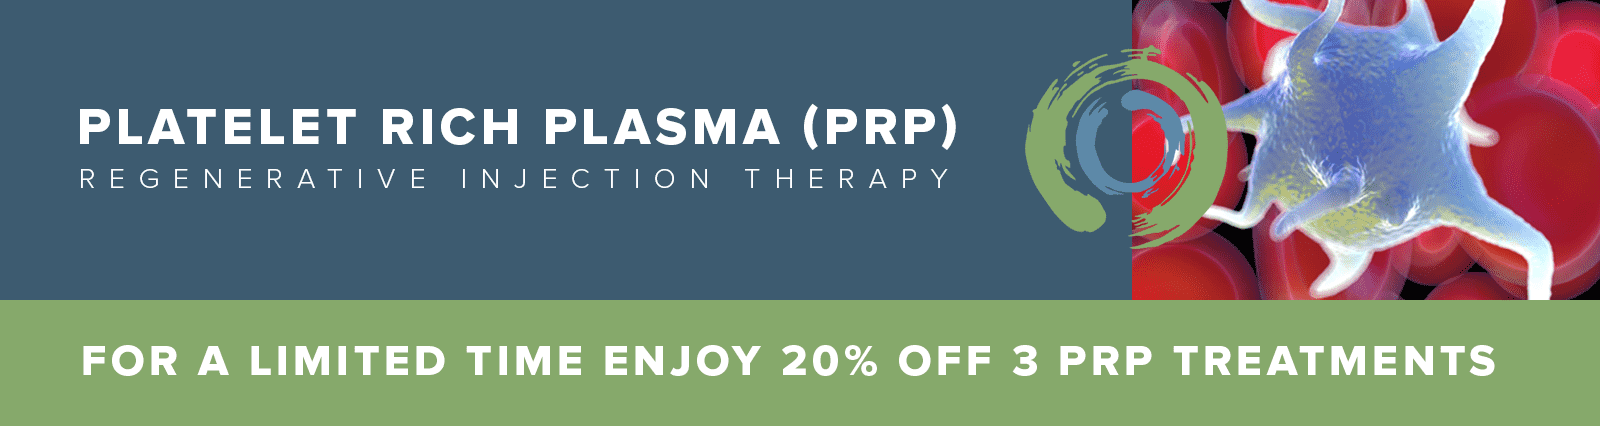 PRP Platelet Rich Plasma in Gilbert, AZ